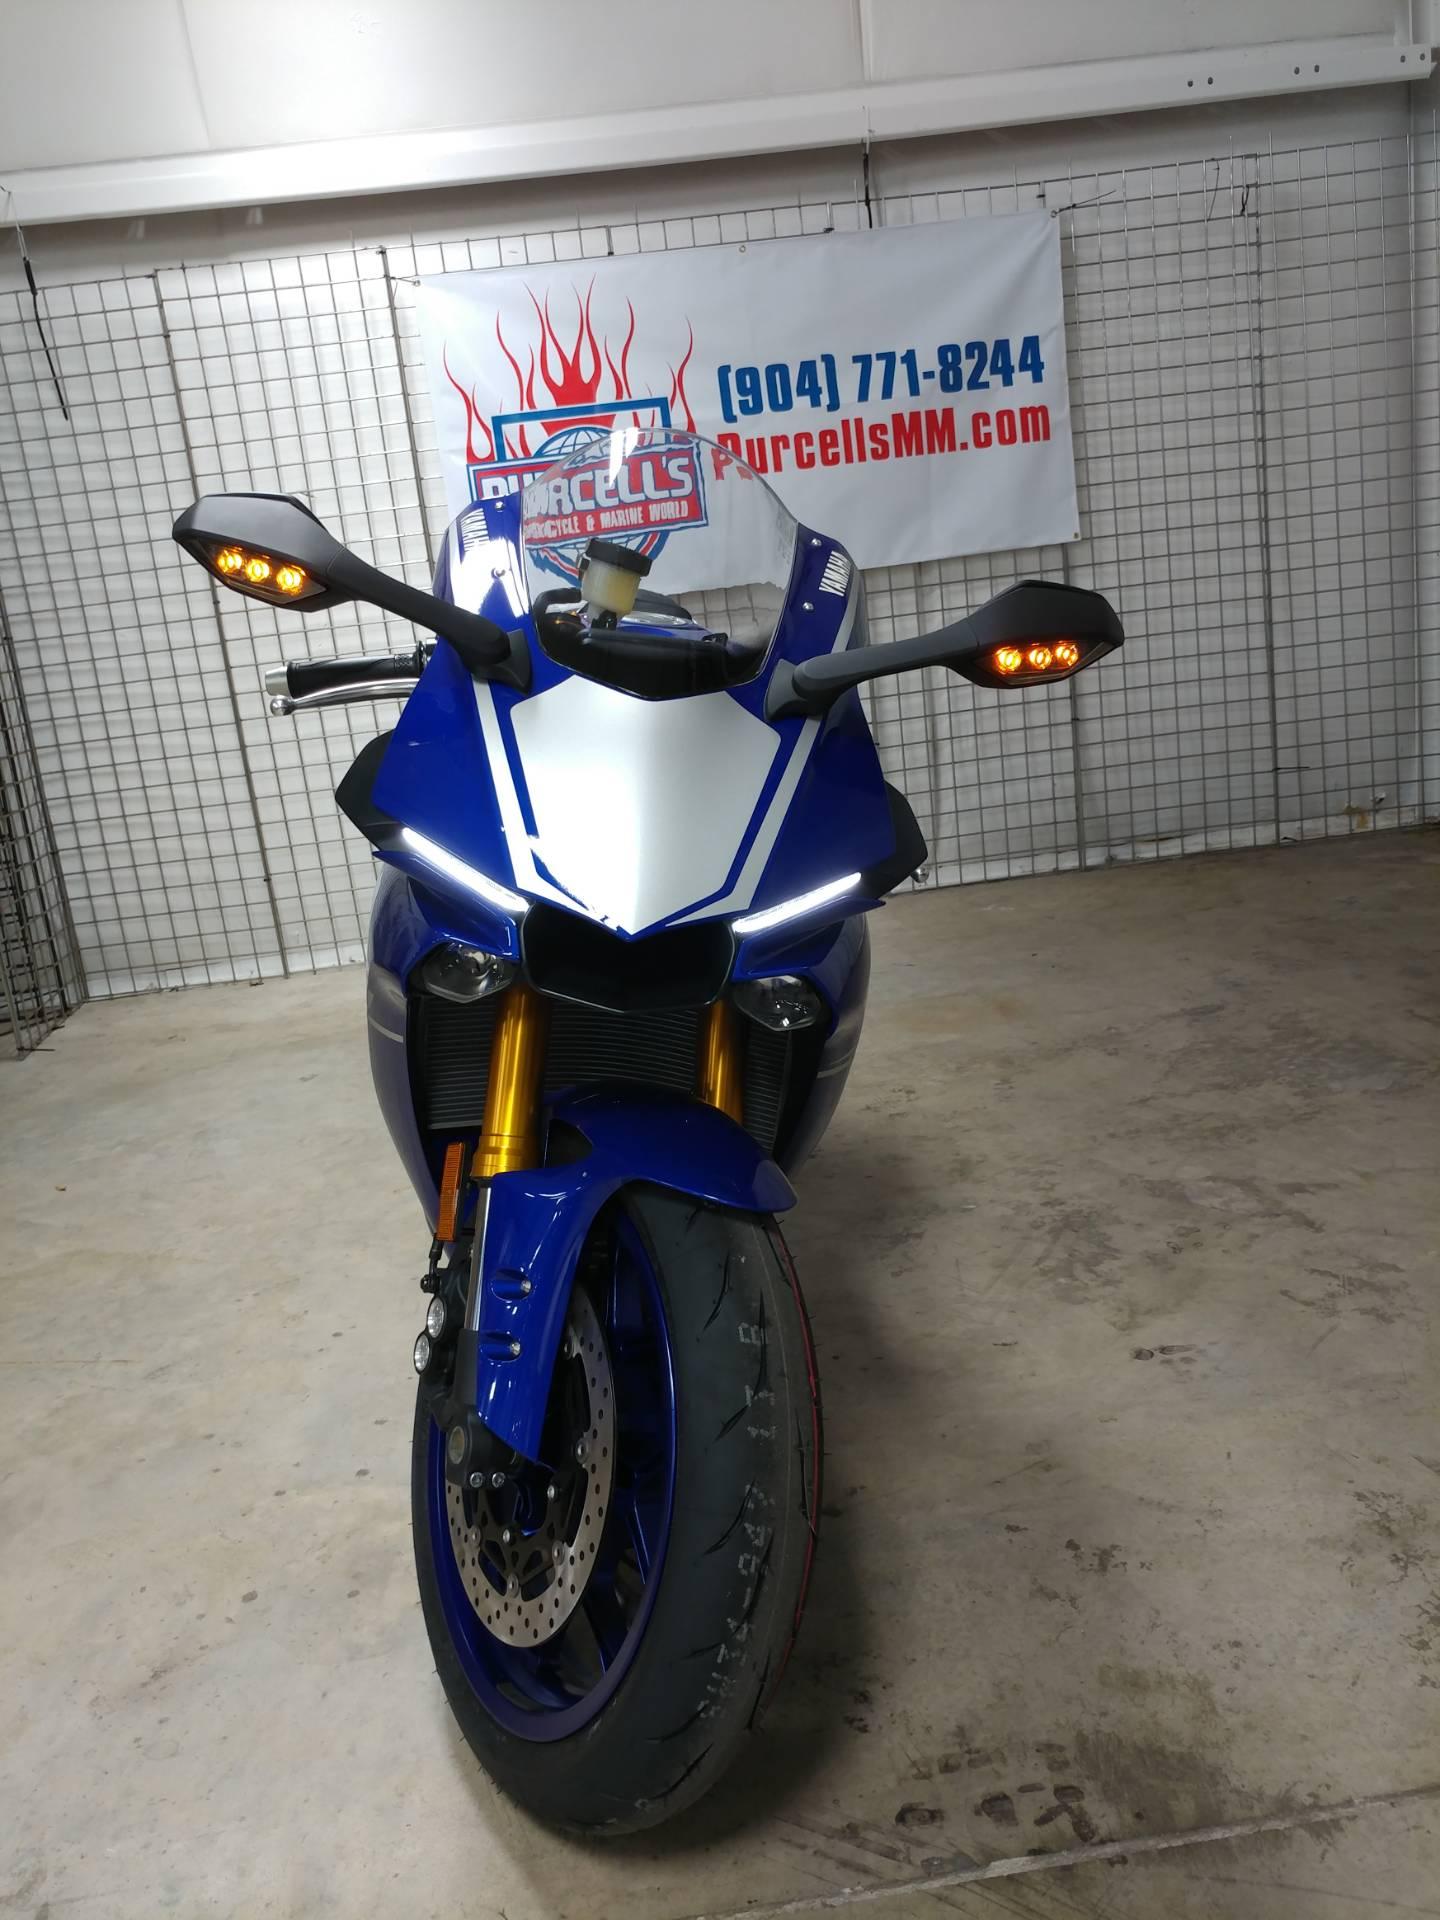 2017 Yamaha YZF-R1 2